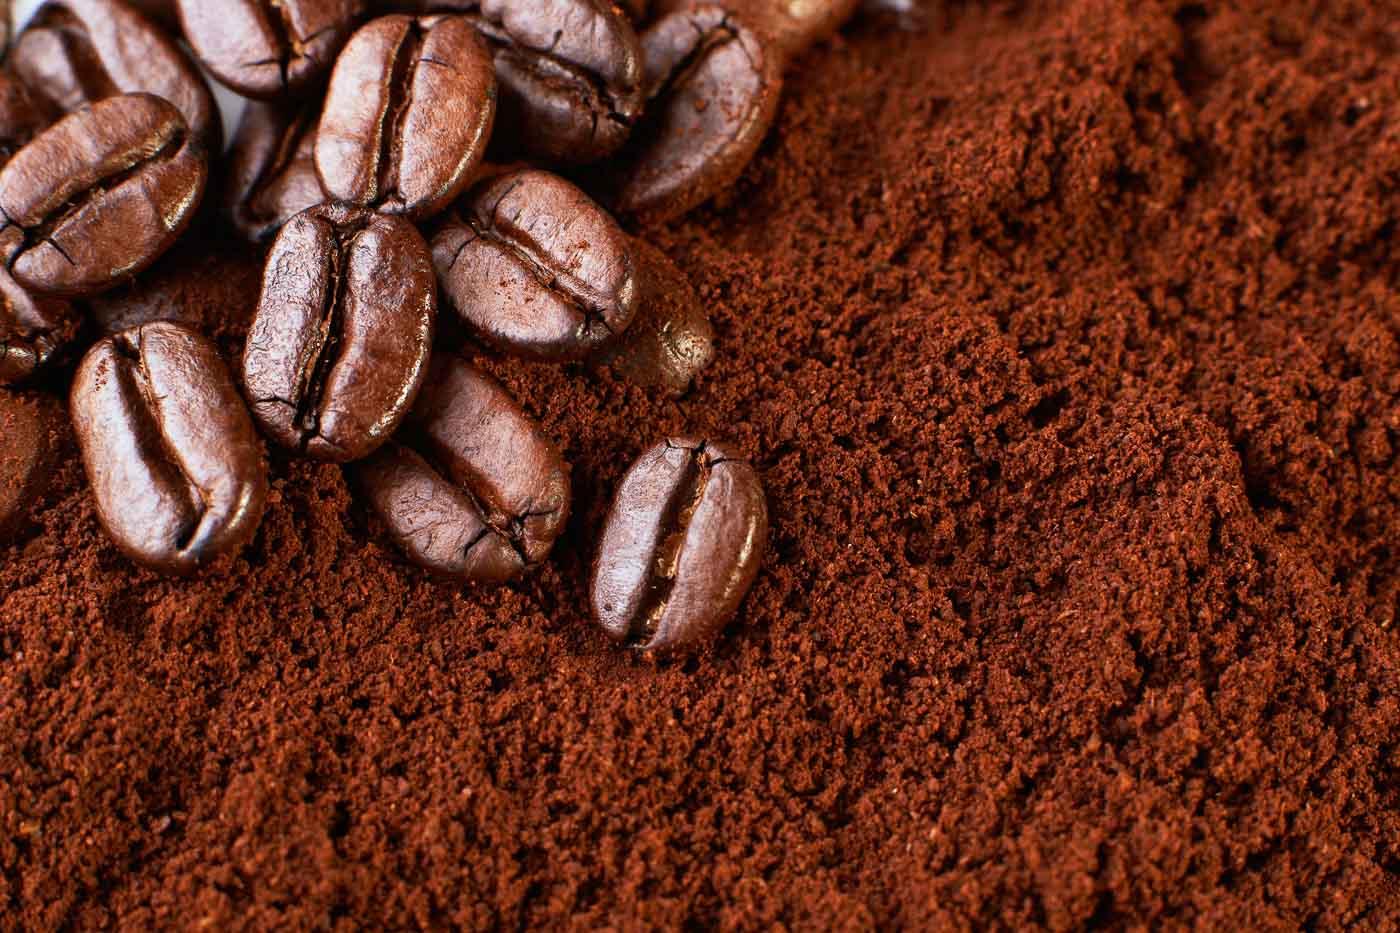 Coffee Beans & Powders - The Coffee Advisors